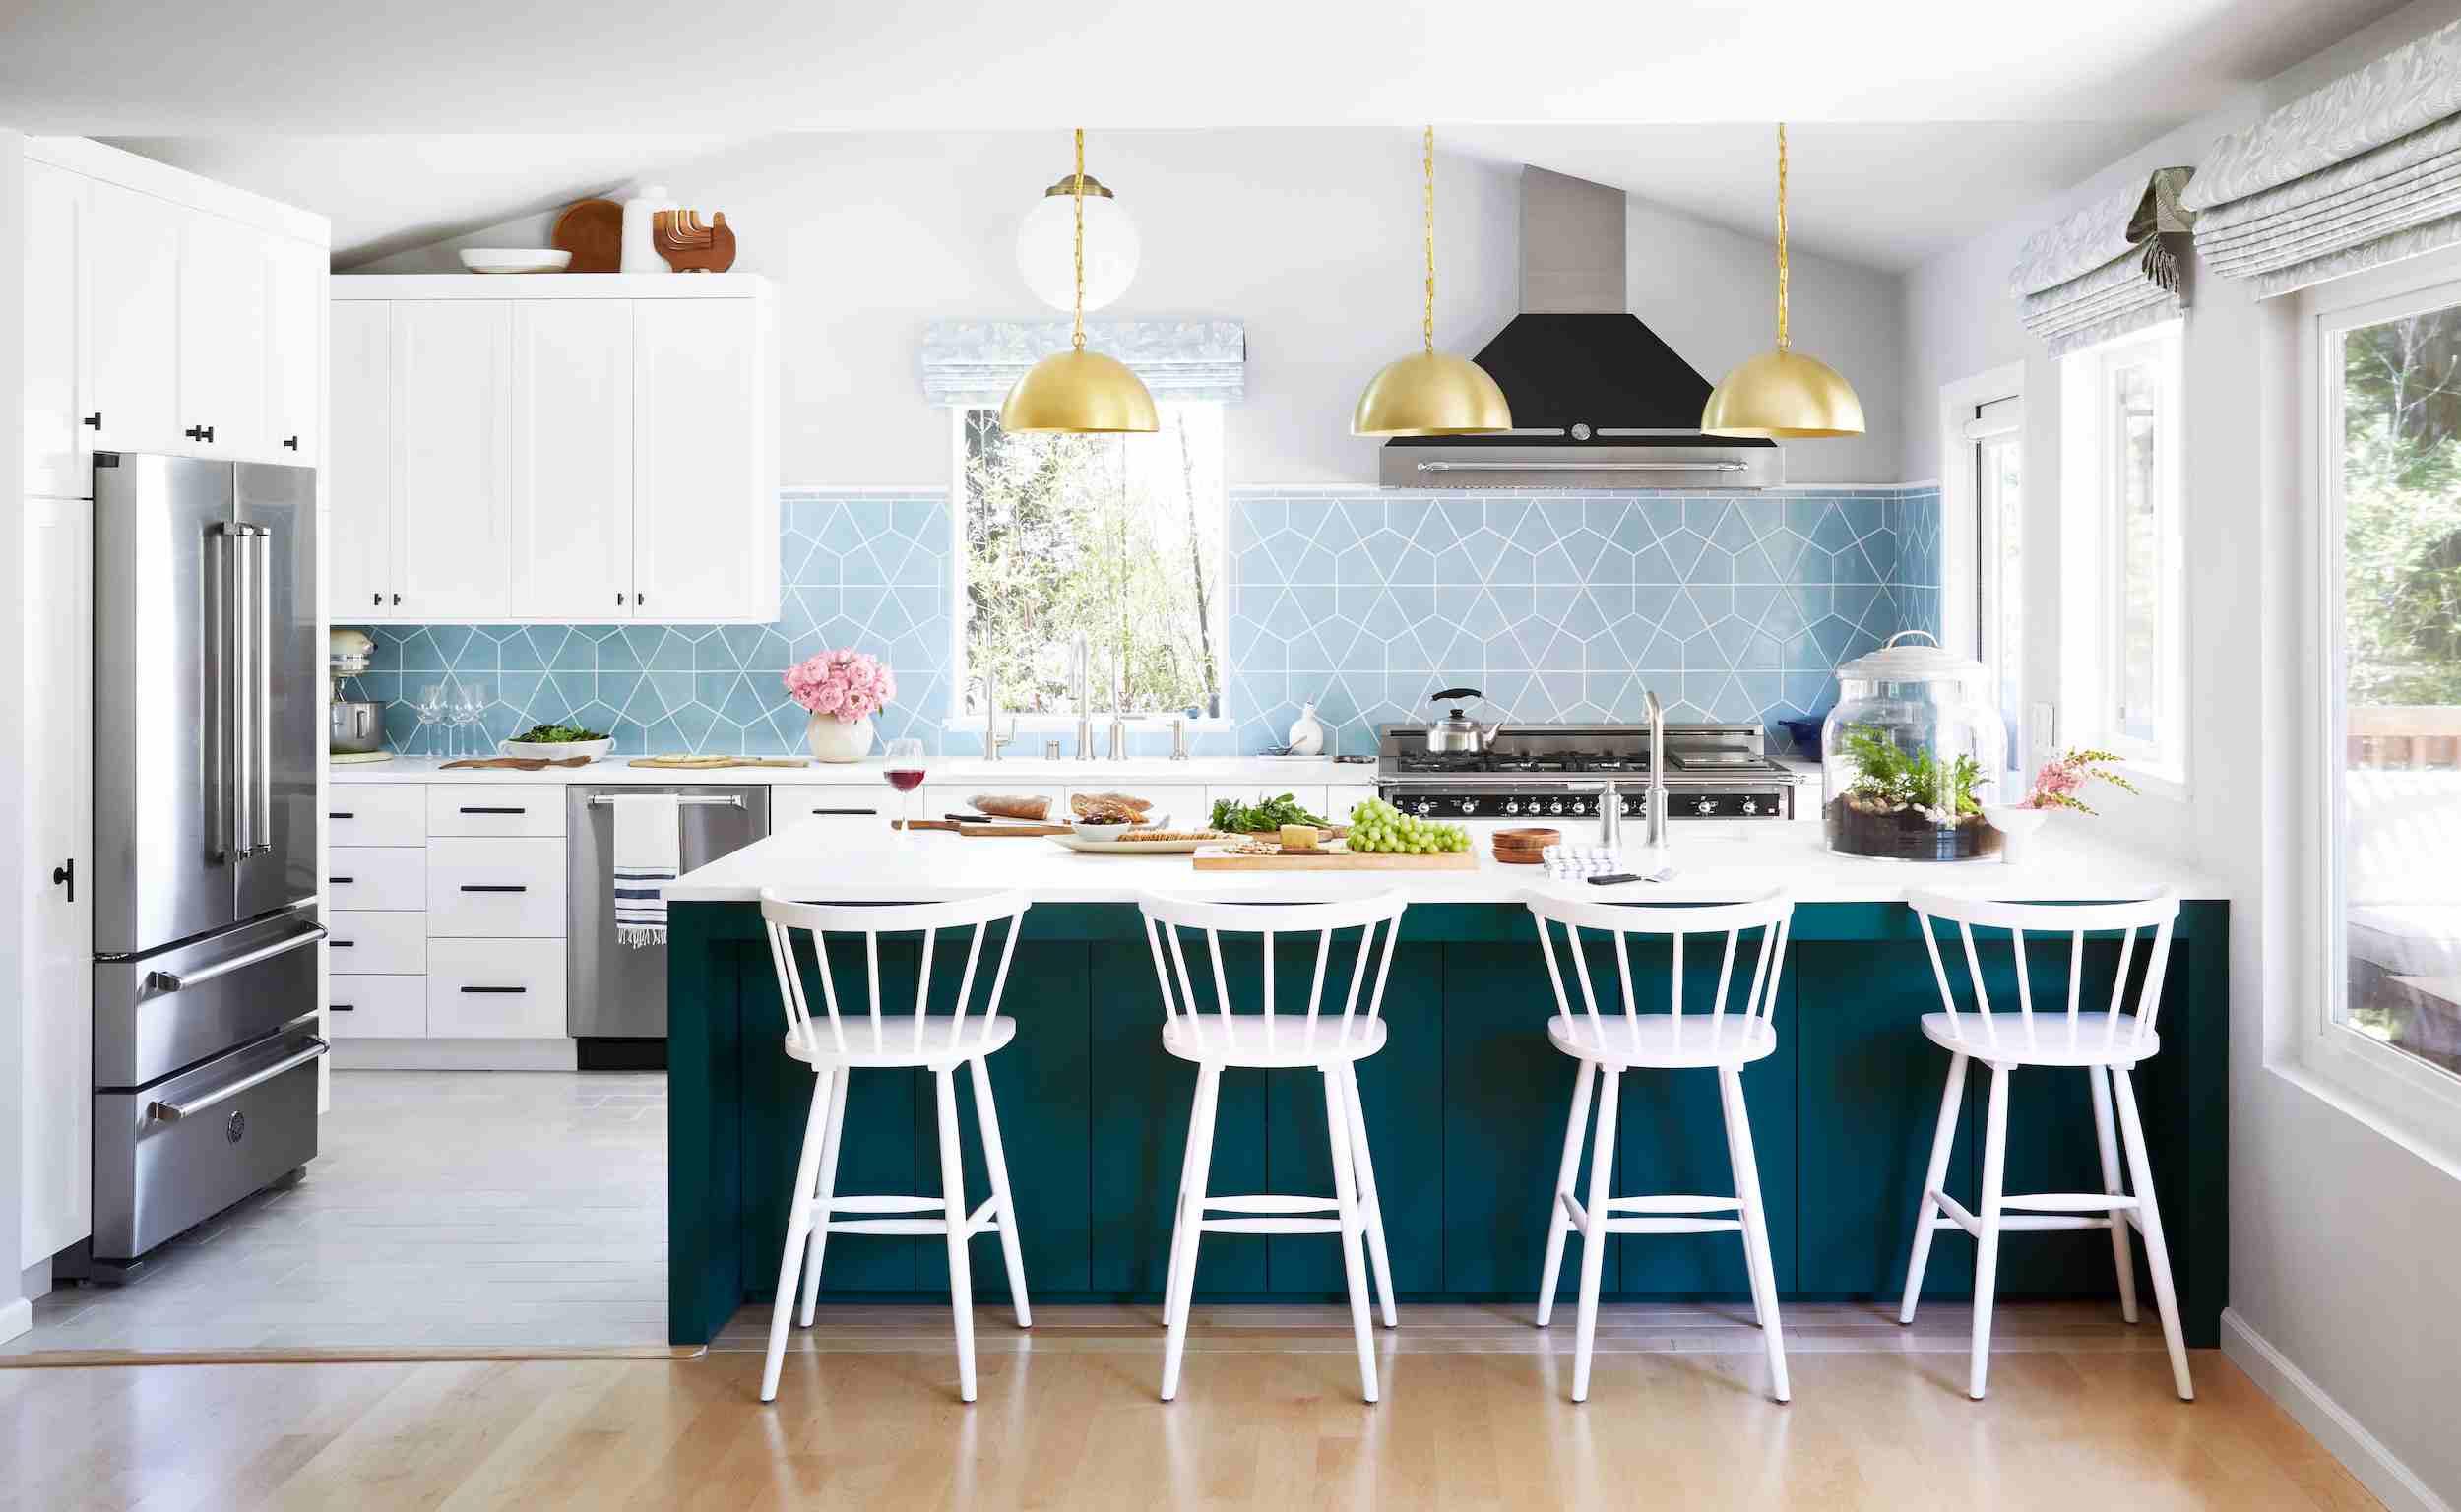 cocina blanca moderna con isla en cascada verde azulado y placa para salpicaduras de azulejos azul claro